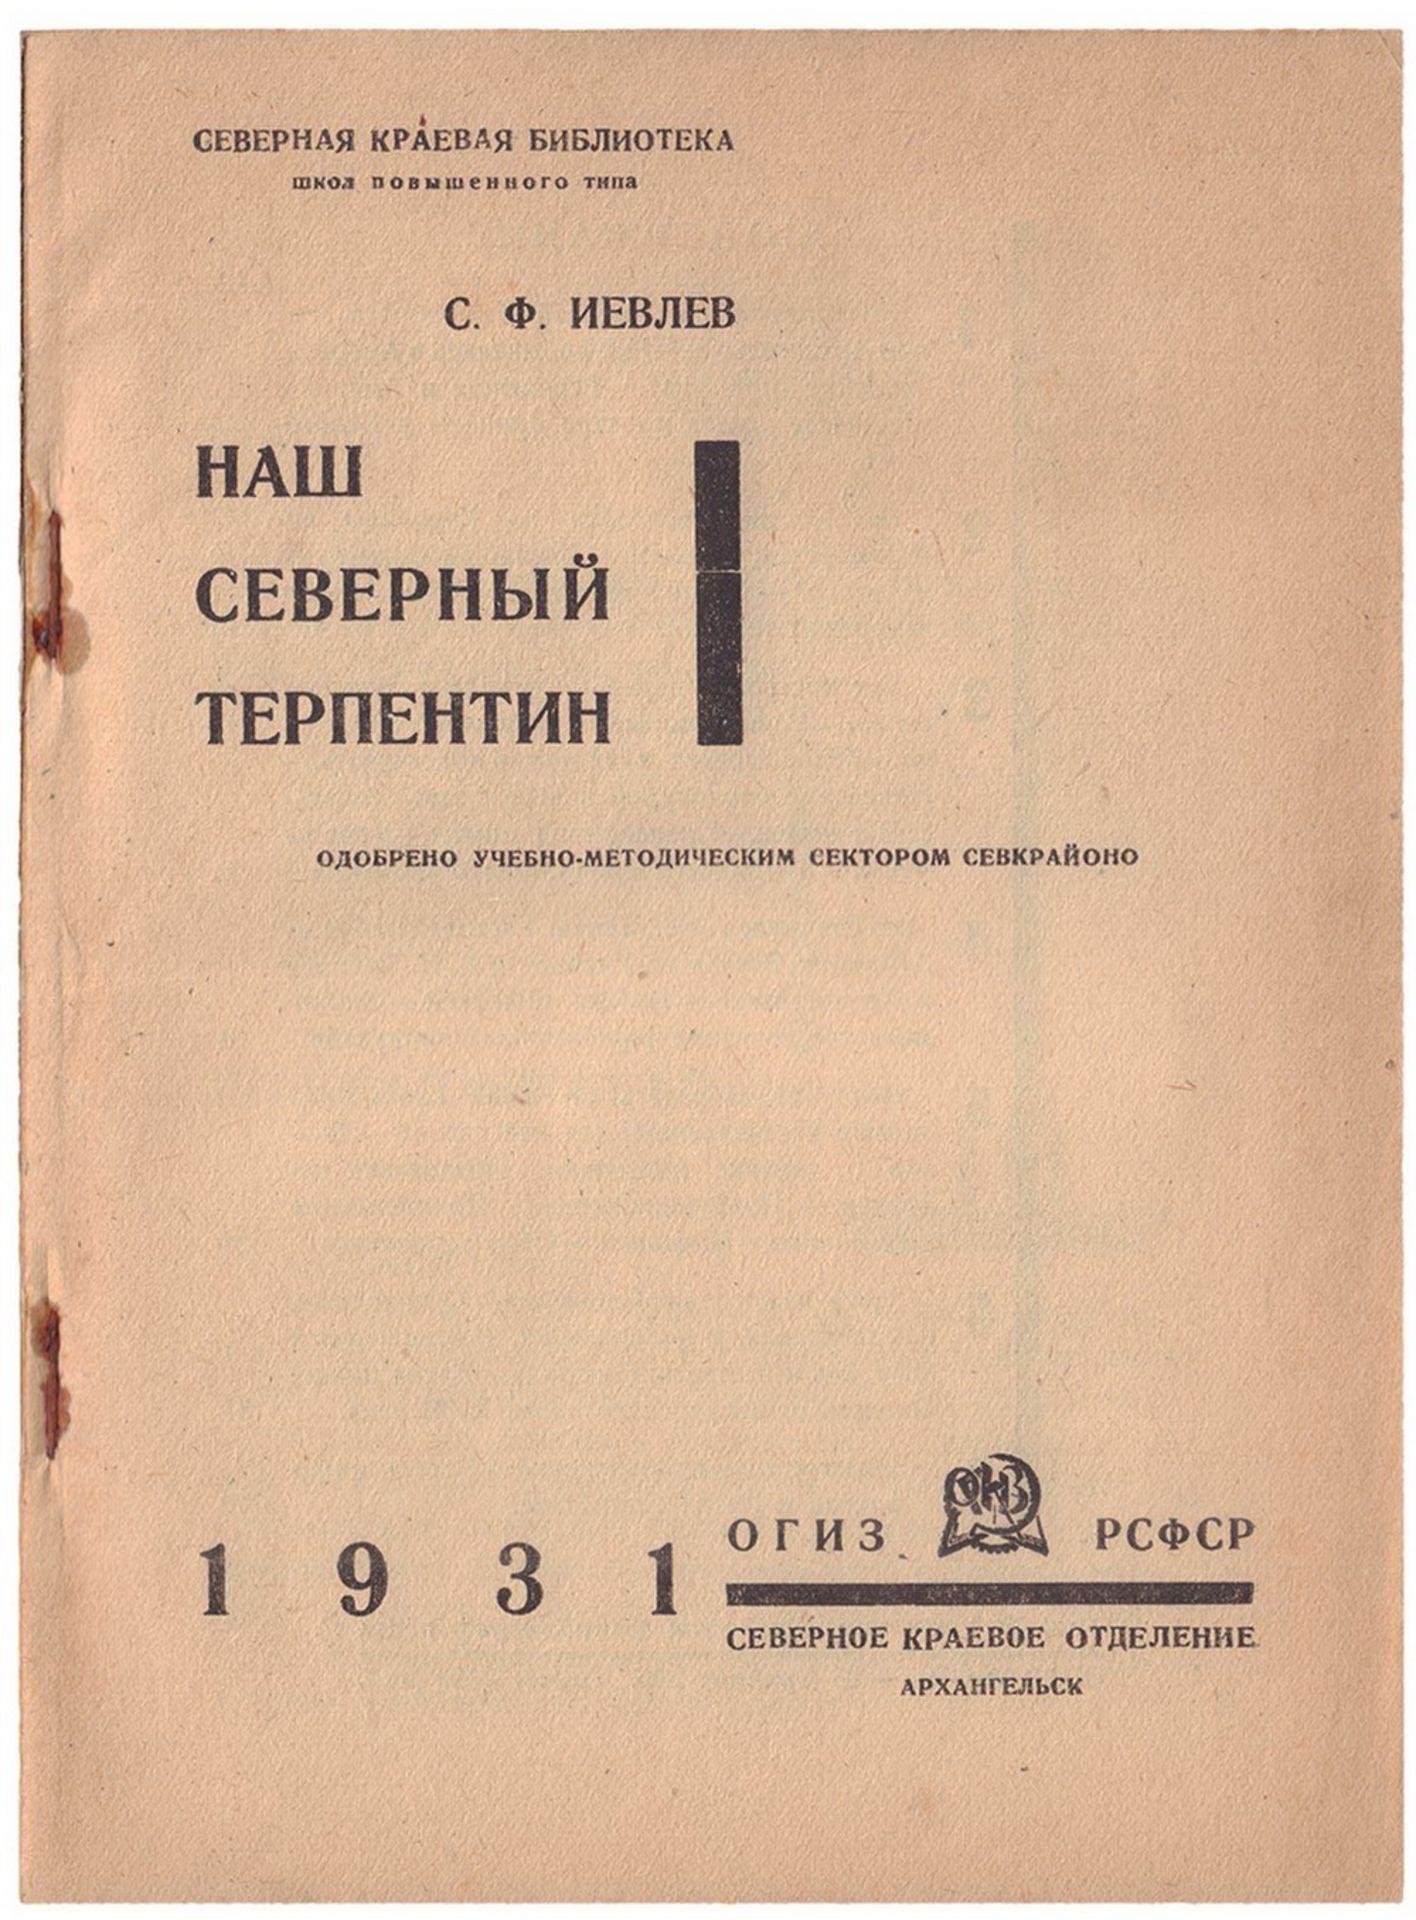 [Soviet art]. Ievlev, S. Our north Turpentine / S.F. Ievlev. - Arkhangelsk, 1931. - 80 pp.: ill.; 29 - Bild 2 aus 6